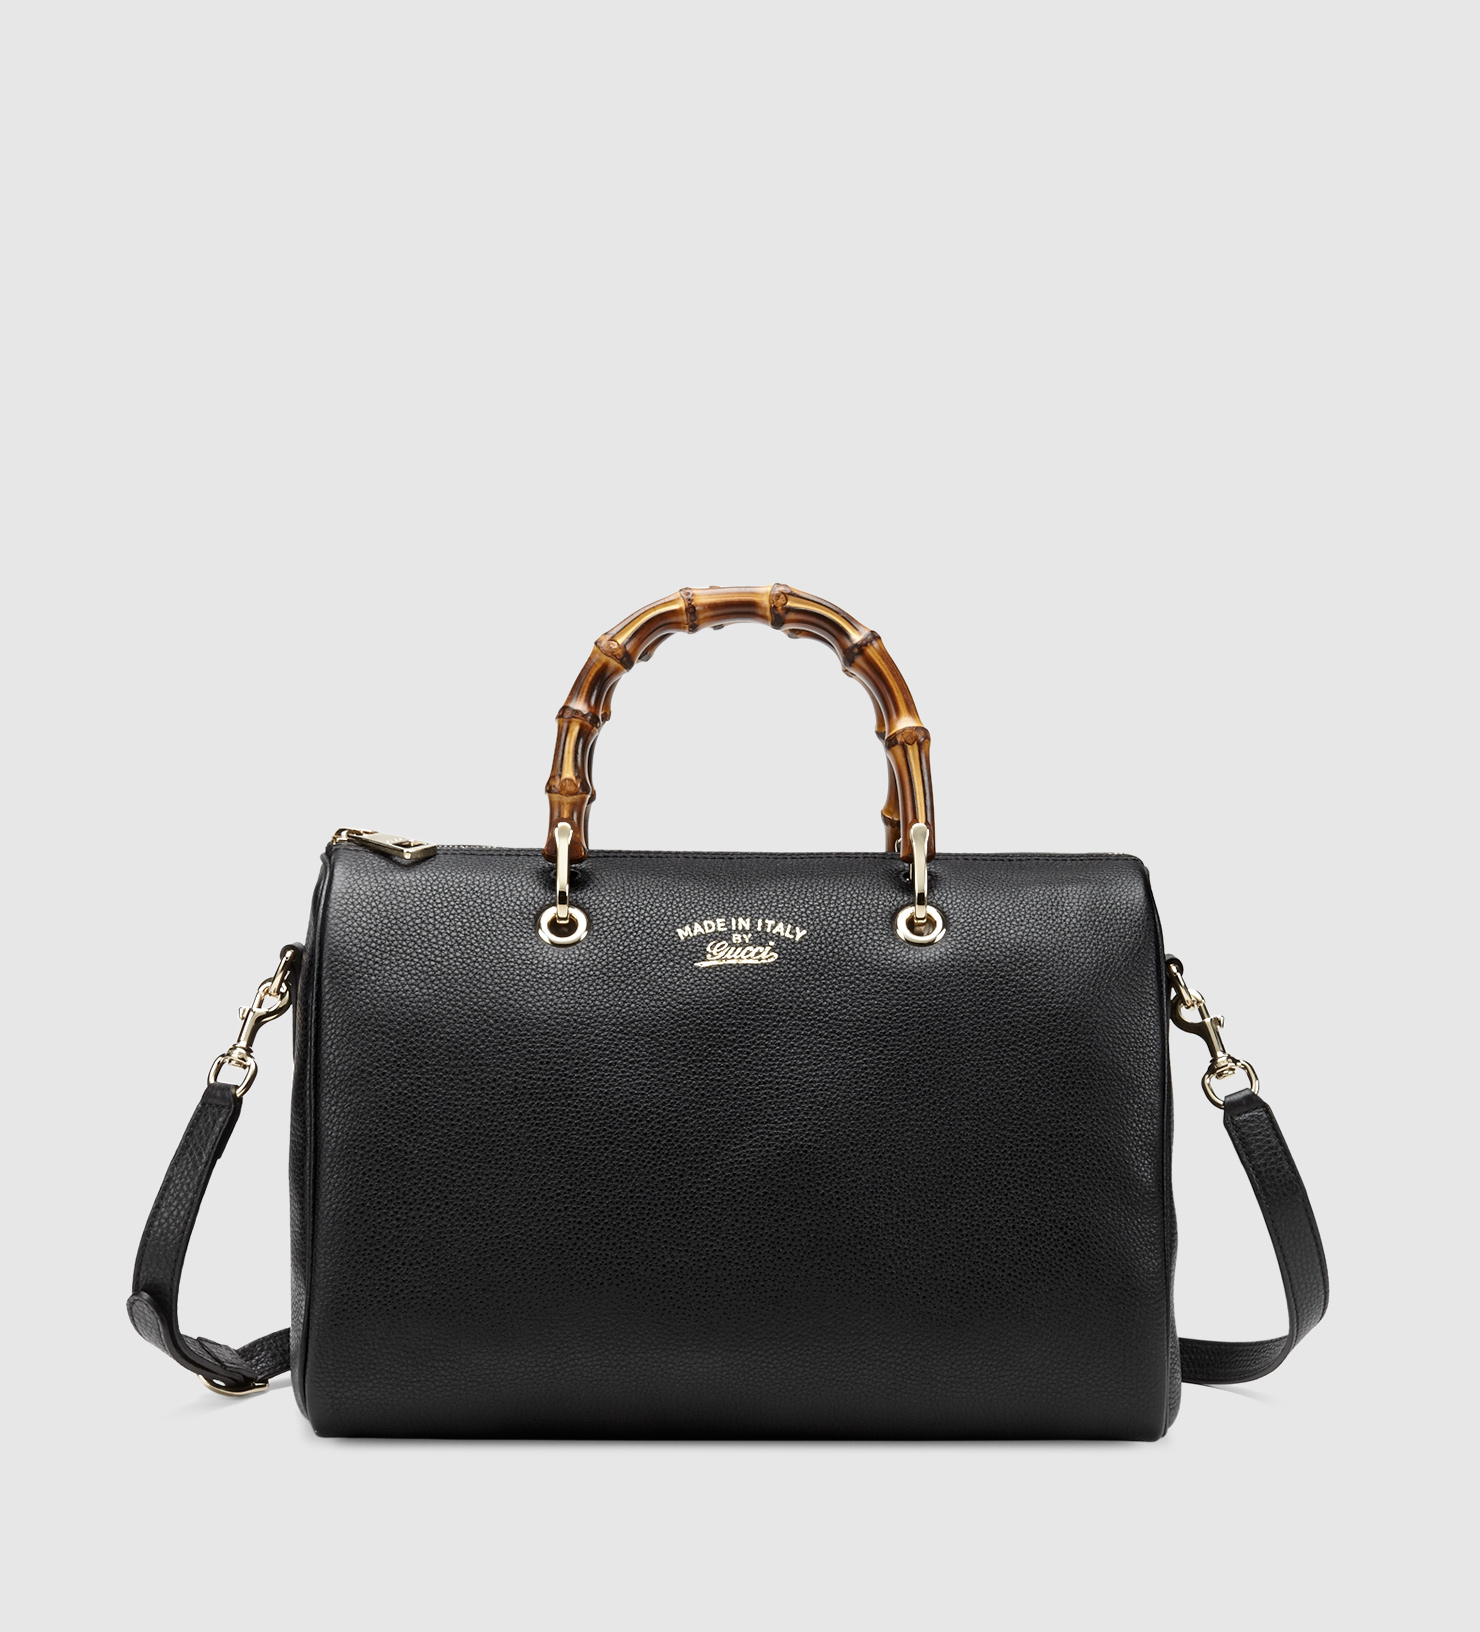 lyst gucci bamboo shopper leather boston bag in black. Black Bedroom Furniture Sets. Home Design Ideas